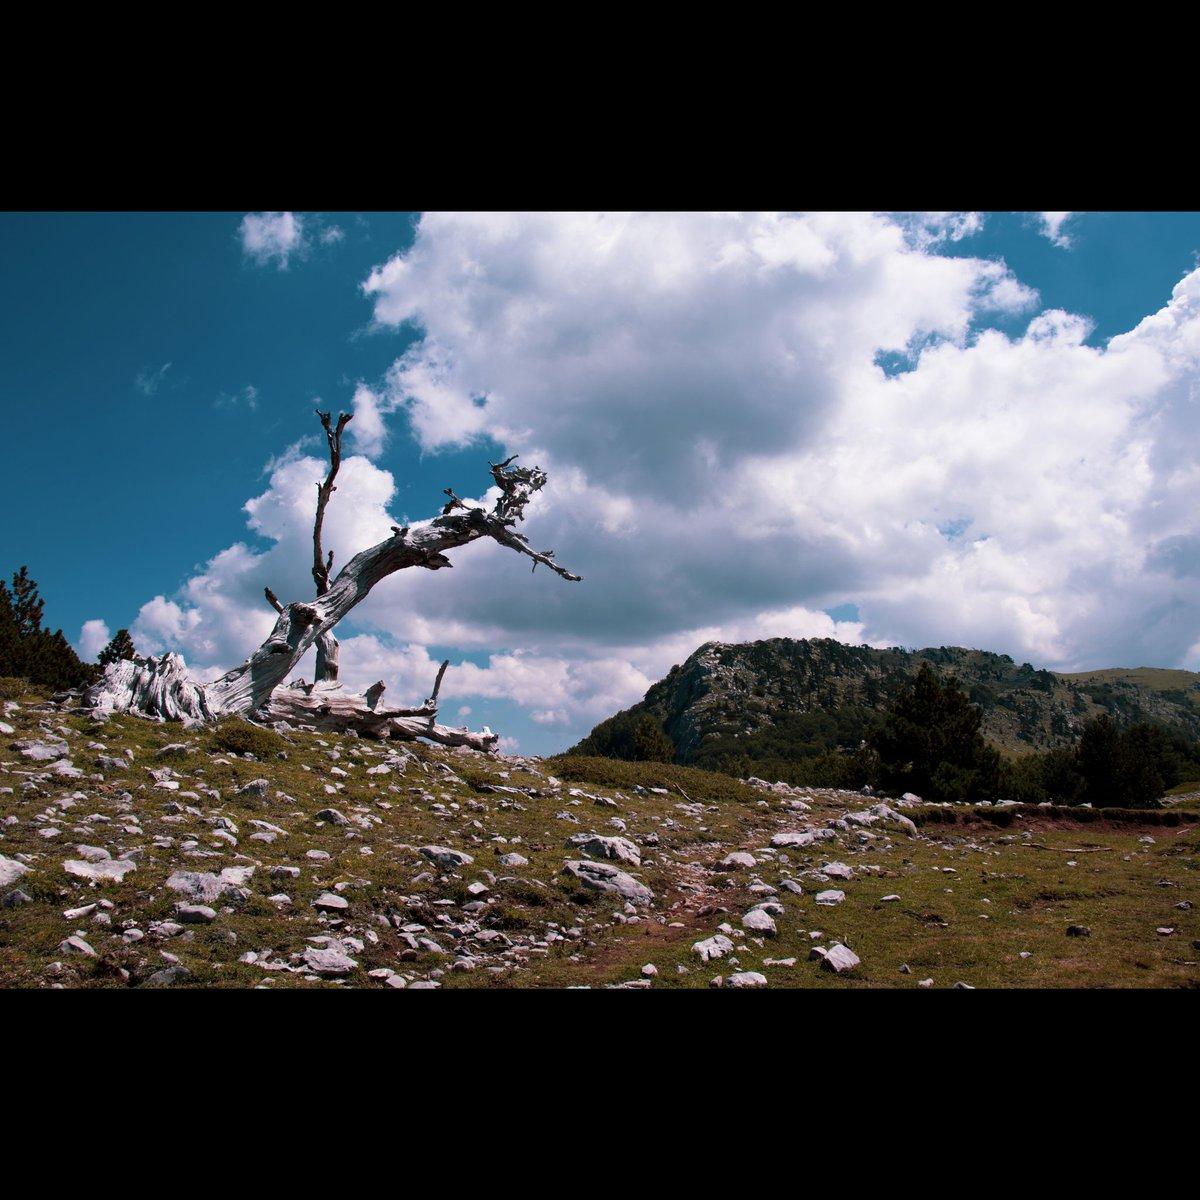 #photography #photooftheday #photo #picoftheday #PictureOfTheDay #Travel #travelphotography #nature #naturelovers #NaturePhotography #Italy https://t.co/4nPQIUGhzm